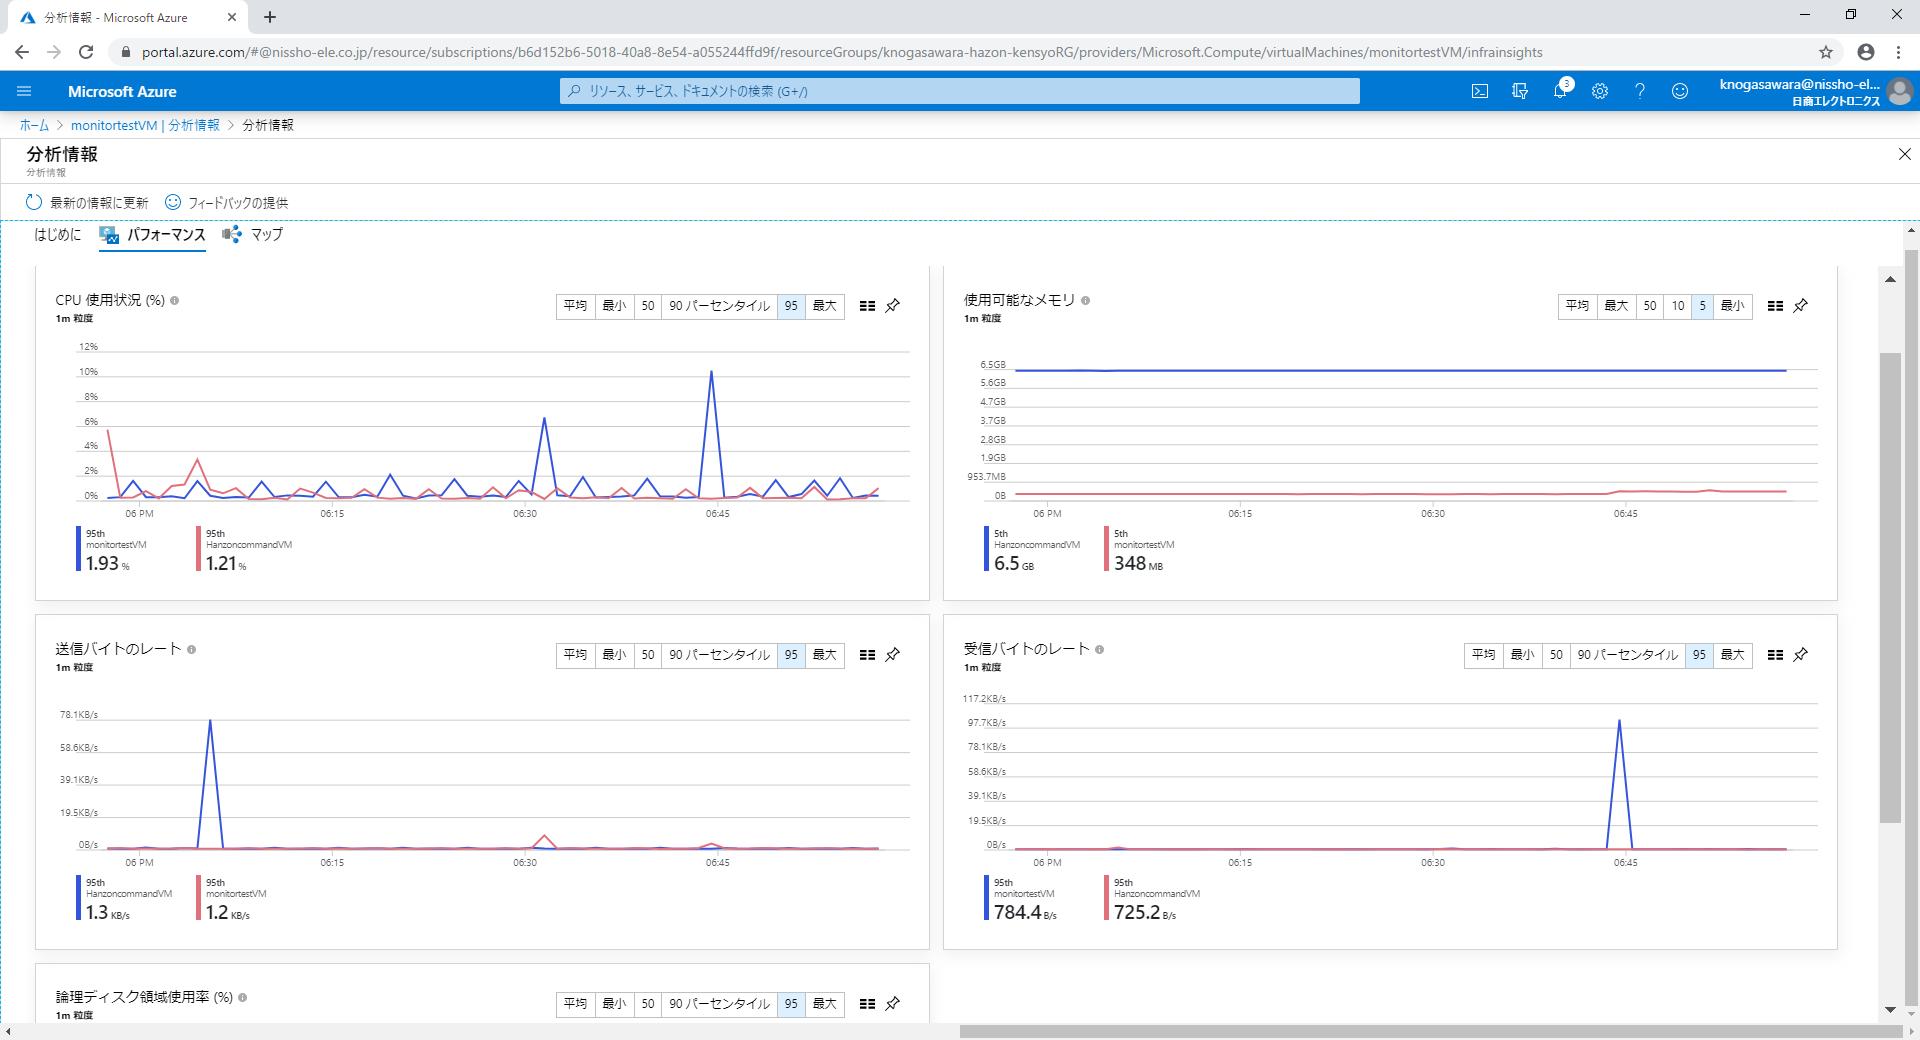 Azure Monitorパフォーマンス